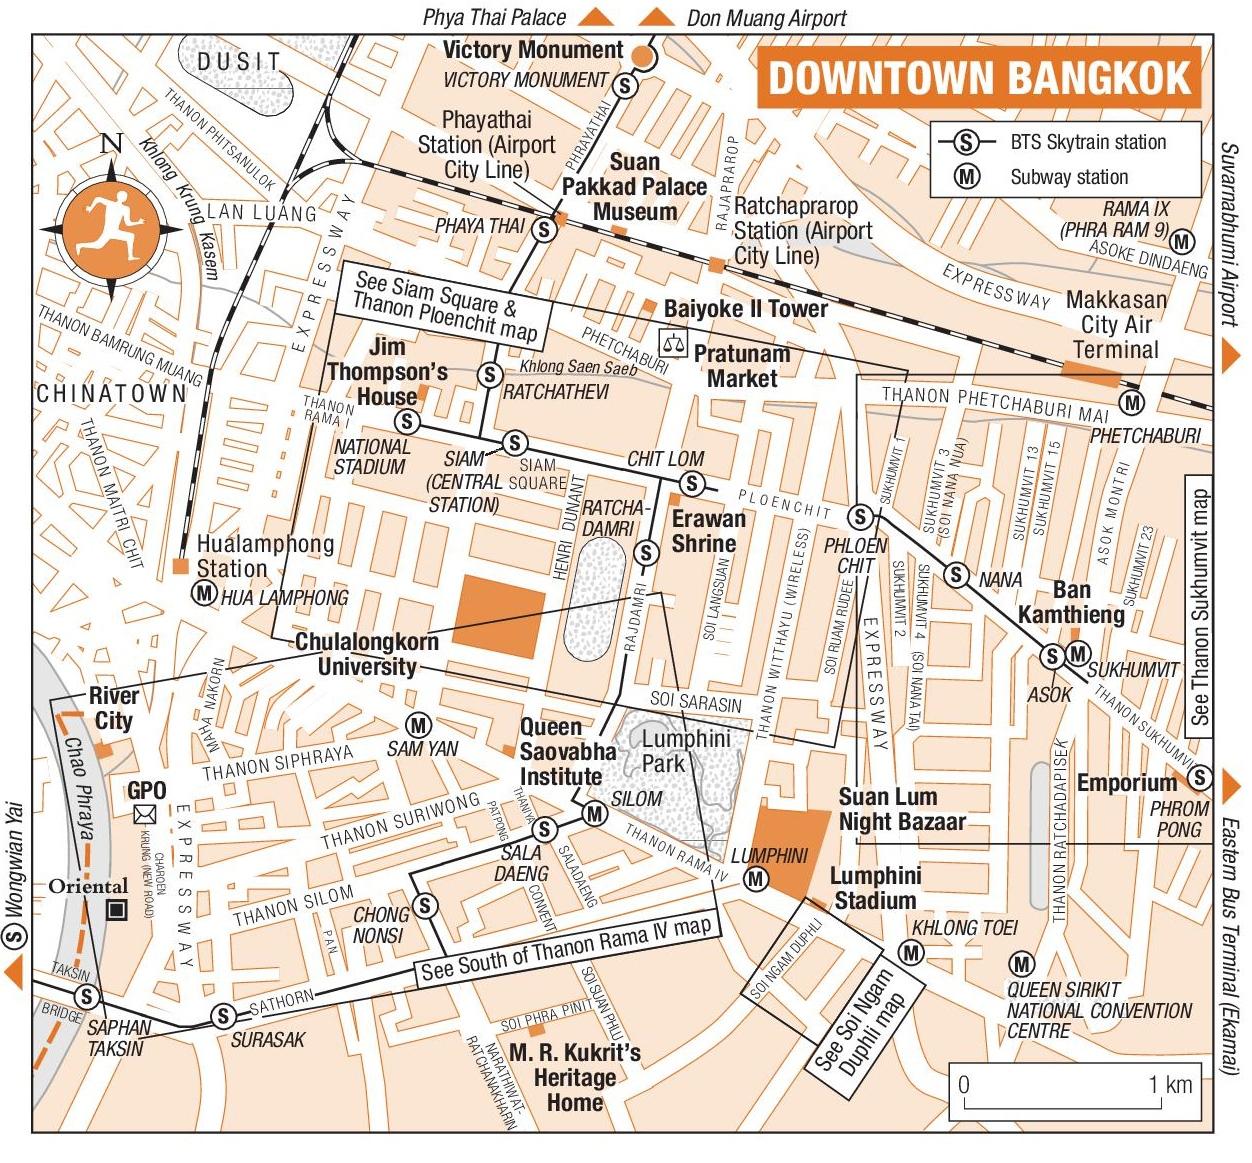 Bangkok downtown map